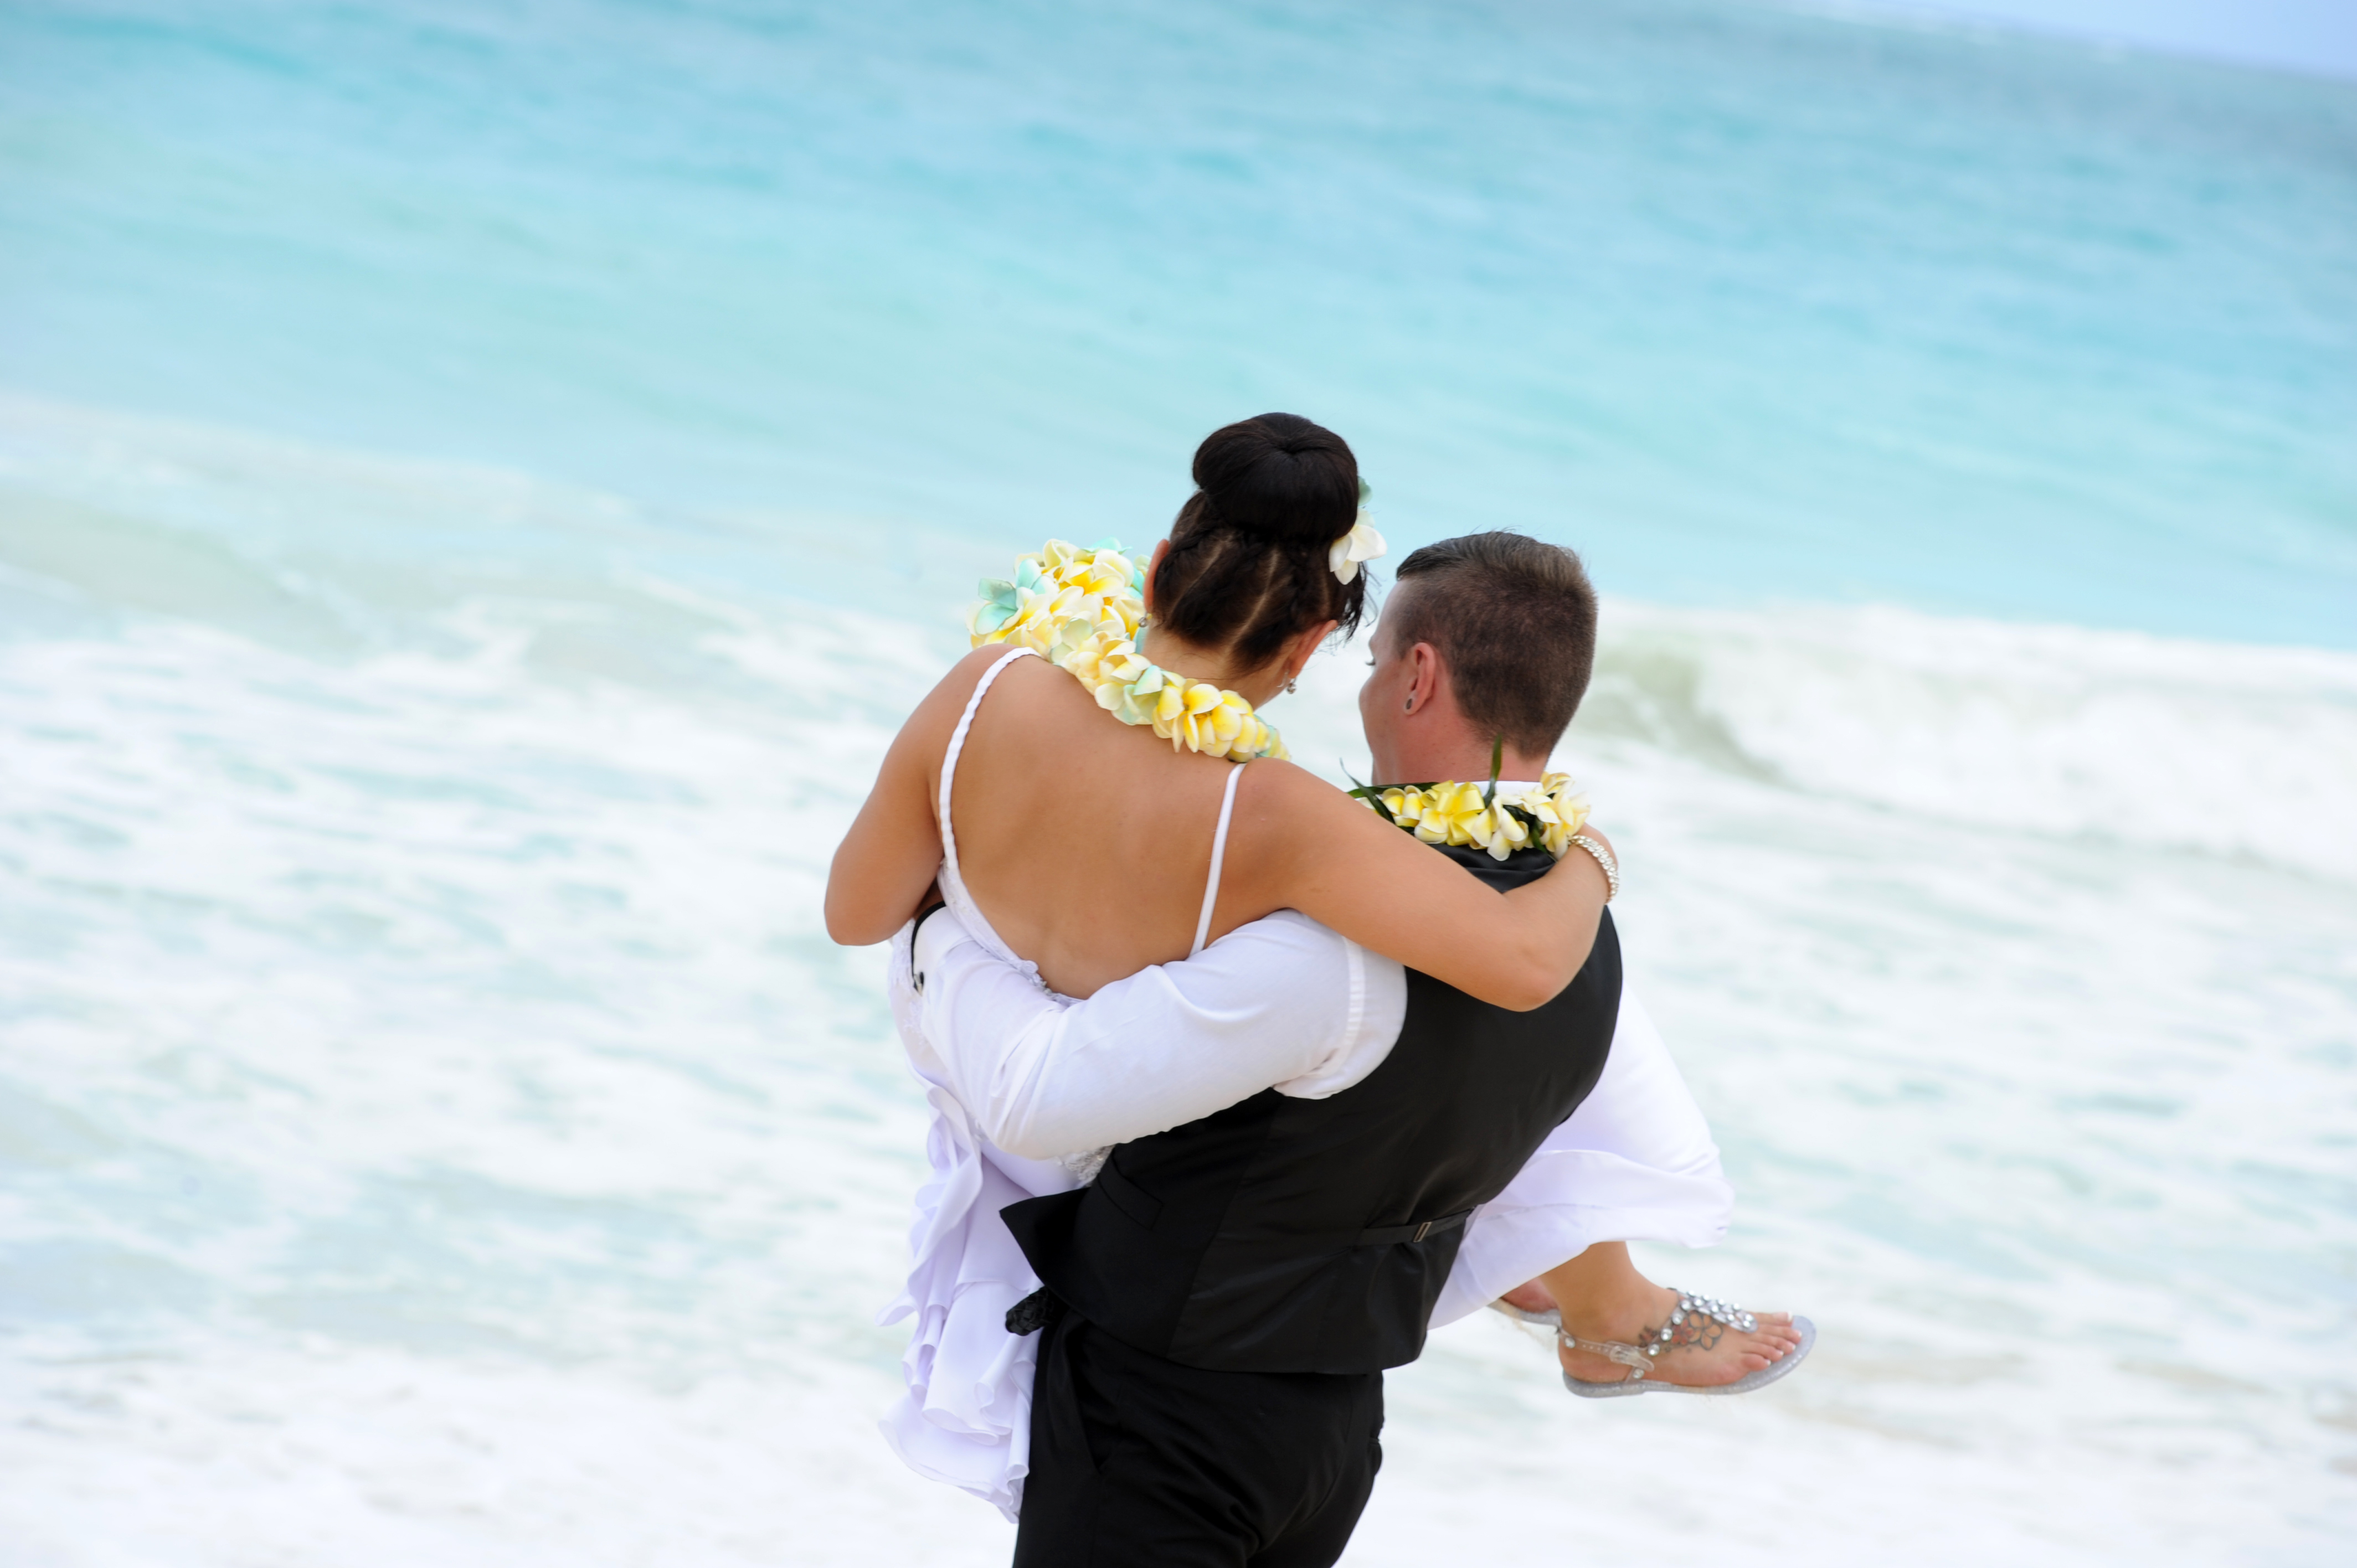 Alohaislandweddings.com- Wedding Picture in Hawaii-31